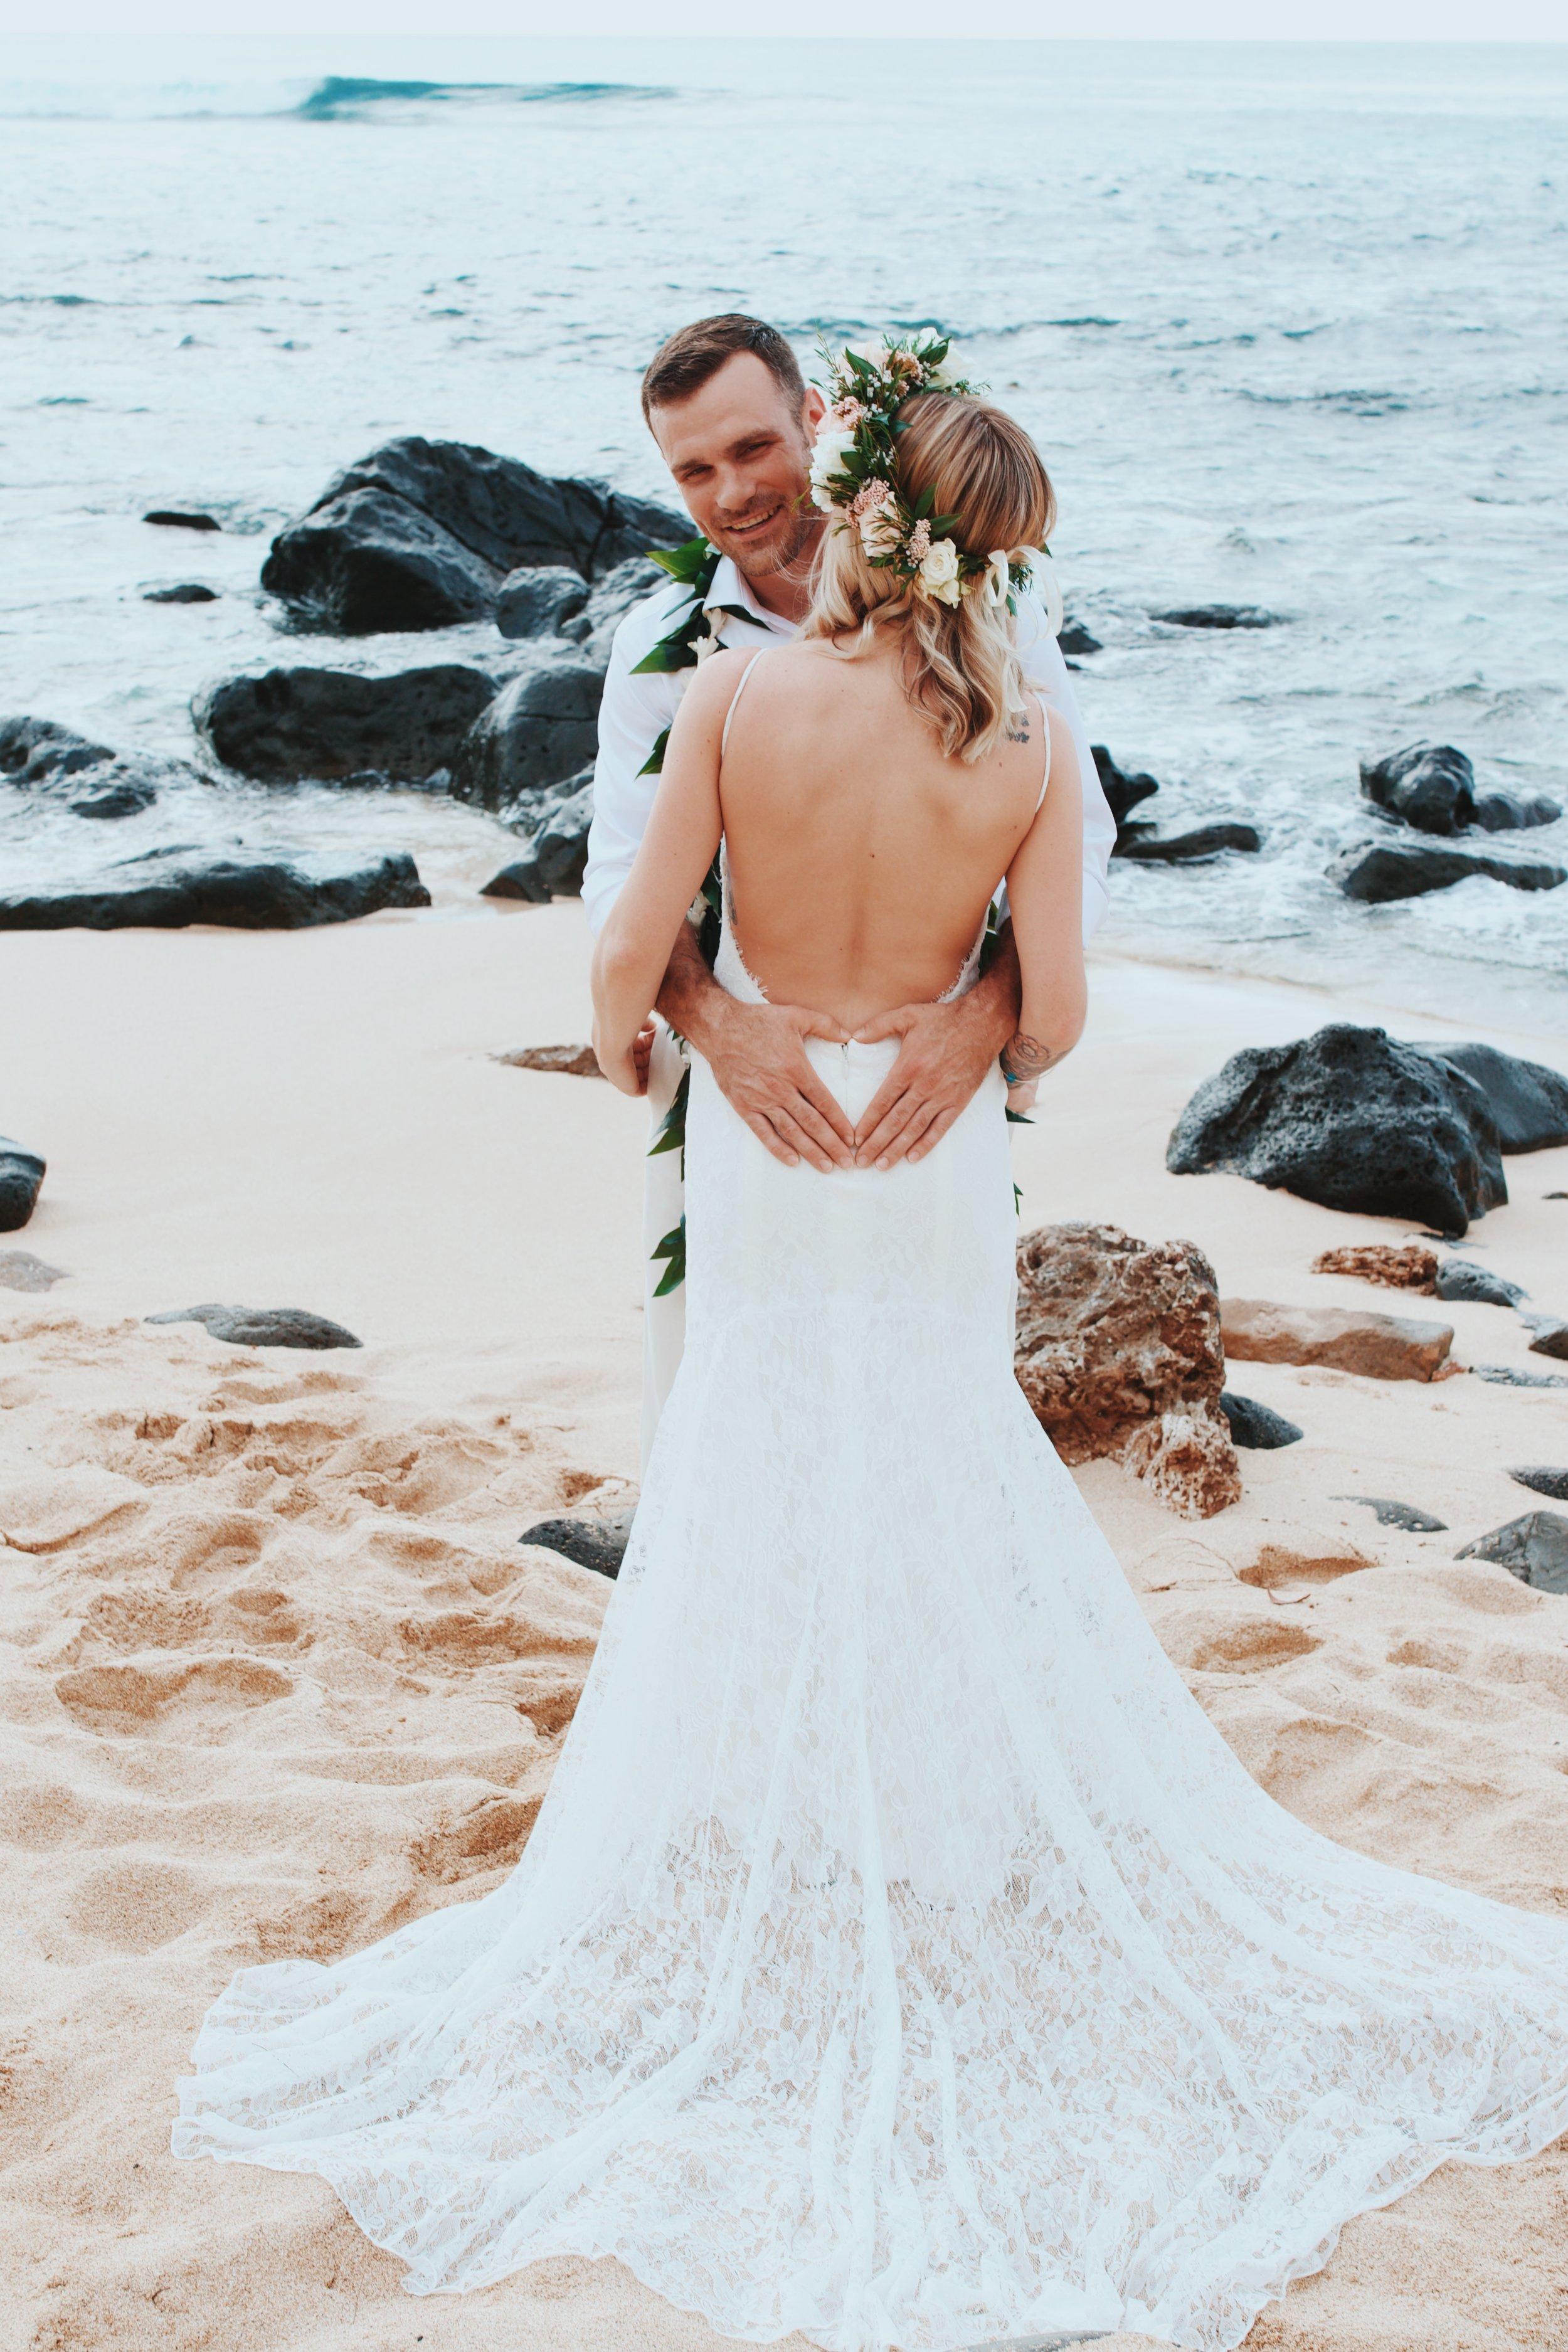 INTIMATE WEDDING & ELOPMENTS: STARTING AT $700.00